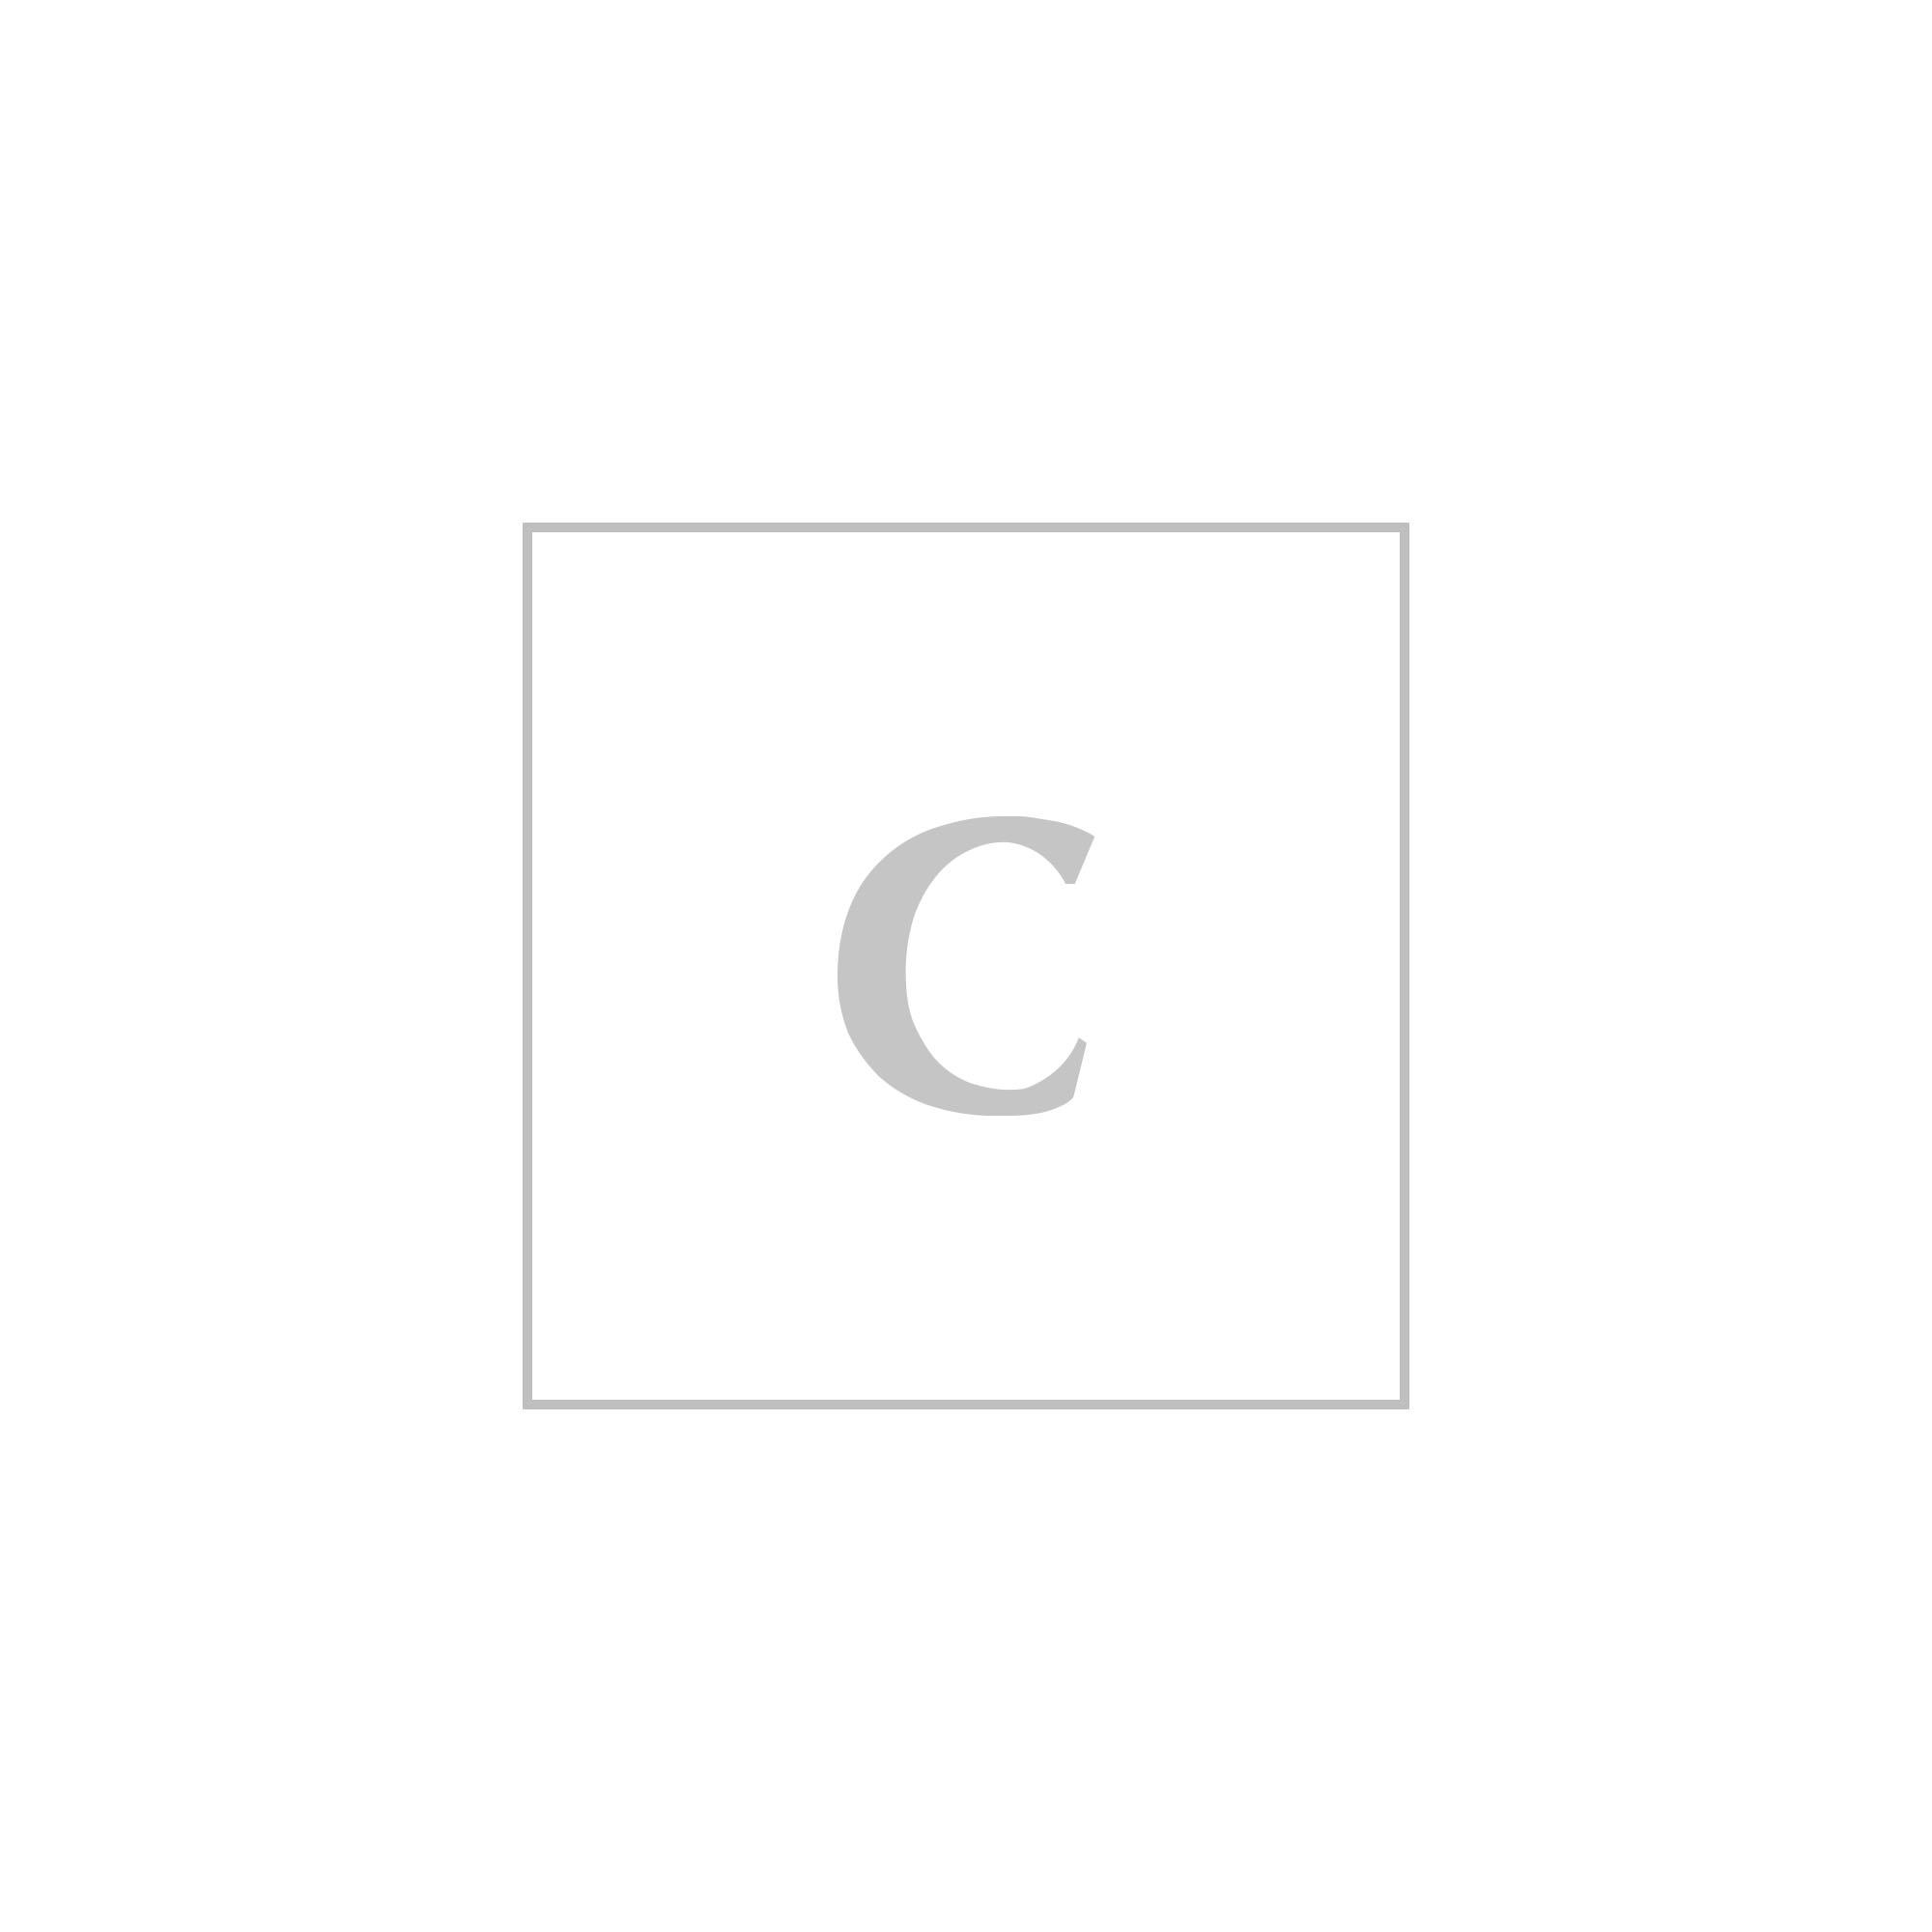 Burberry borsa mini canter